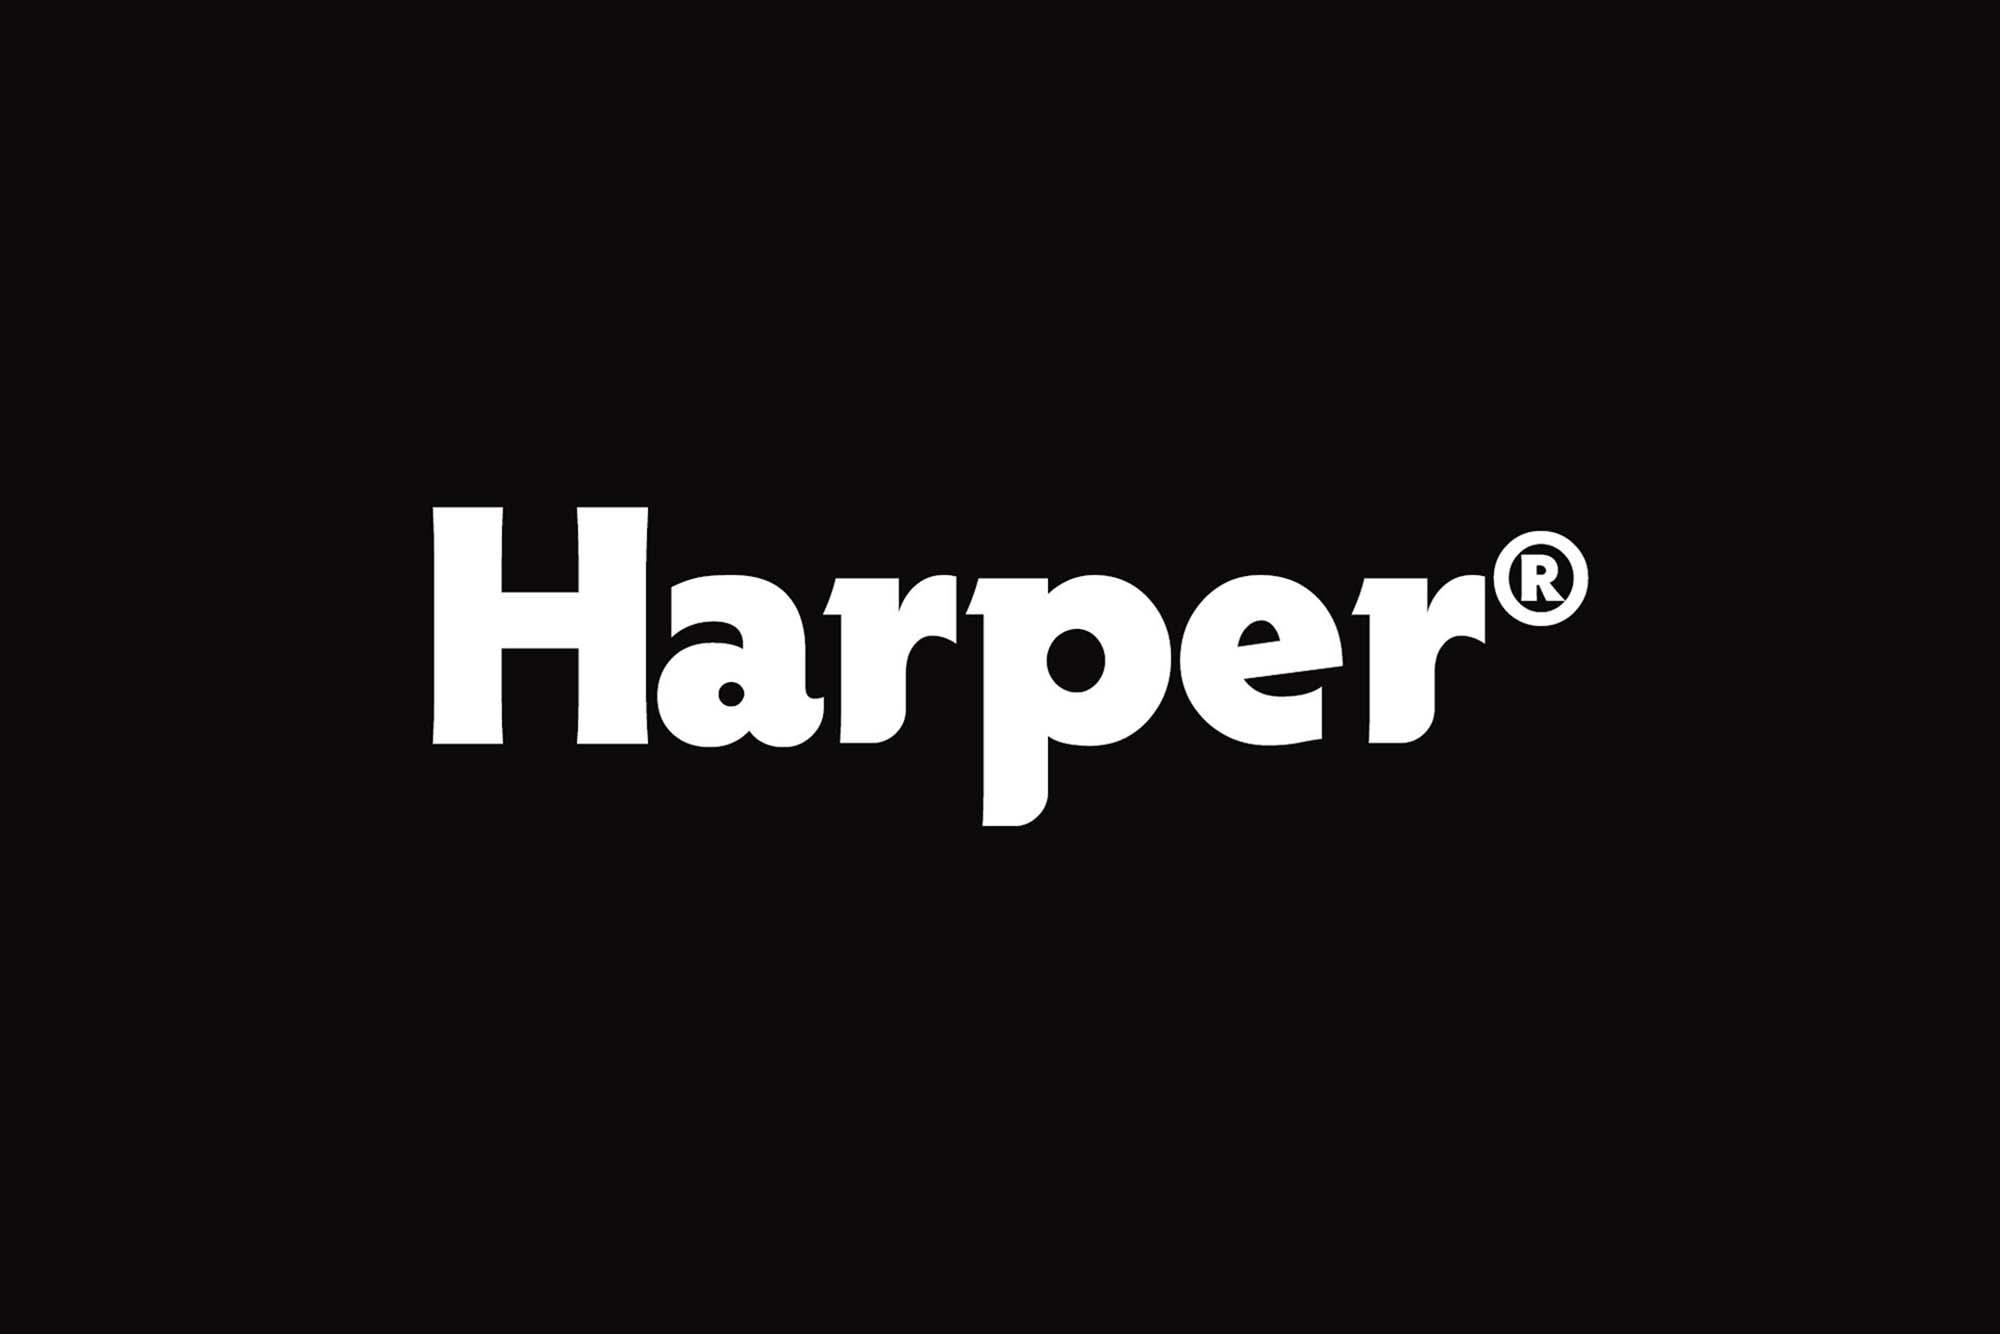 Harper Sans serif Font